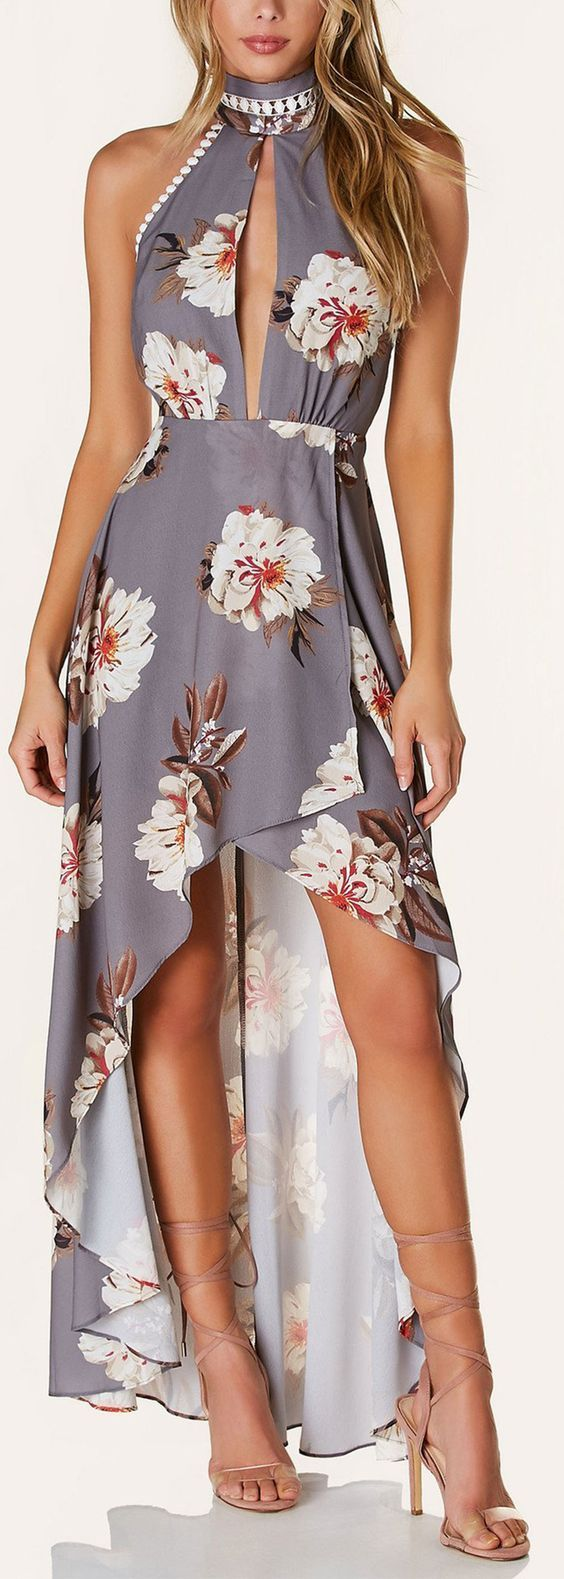 maxi dress,casual dress,dresses outfits,homecoming dresses,flower girl dresses